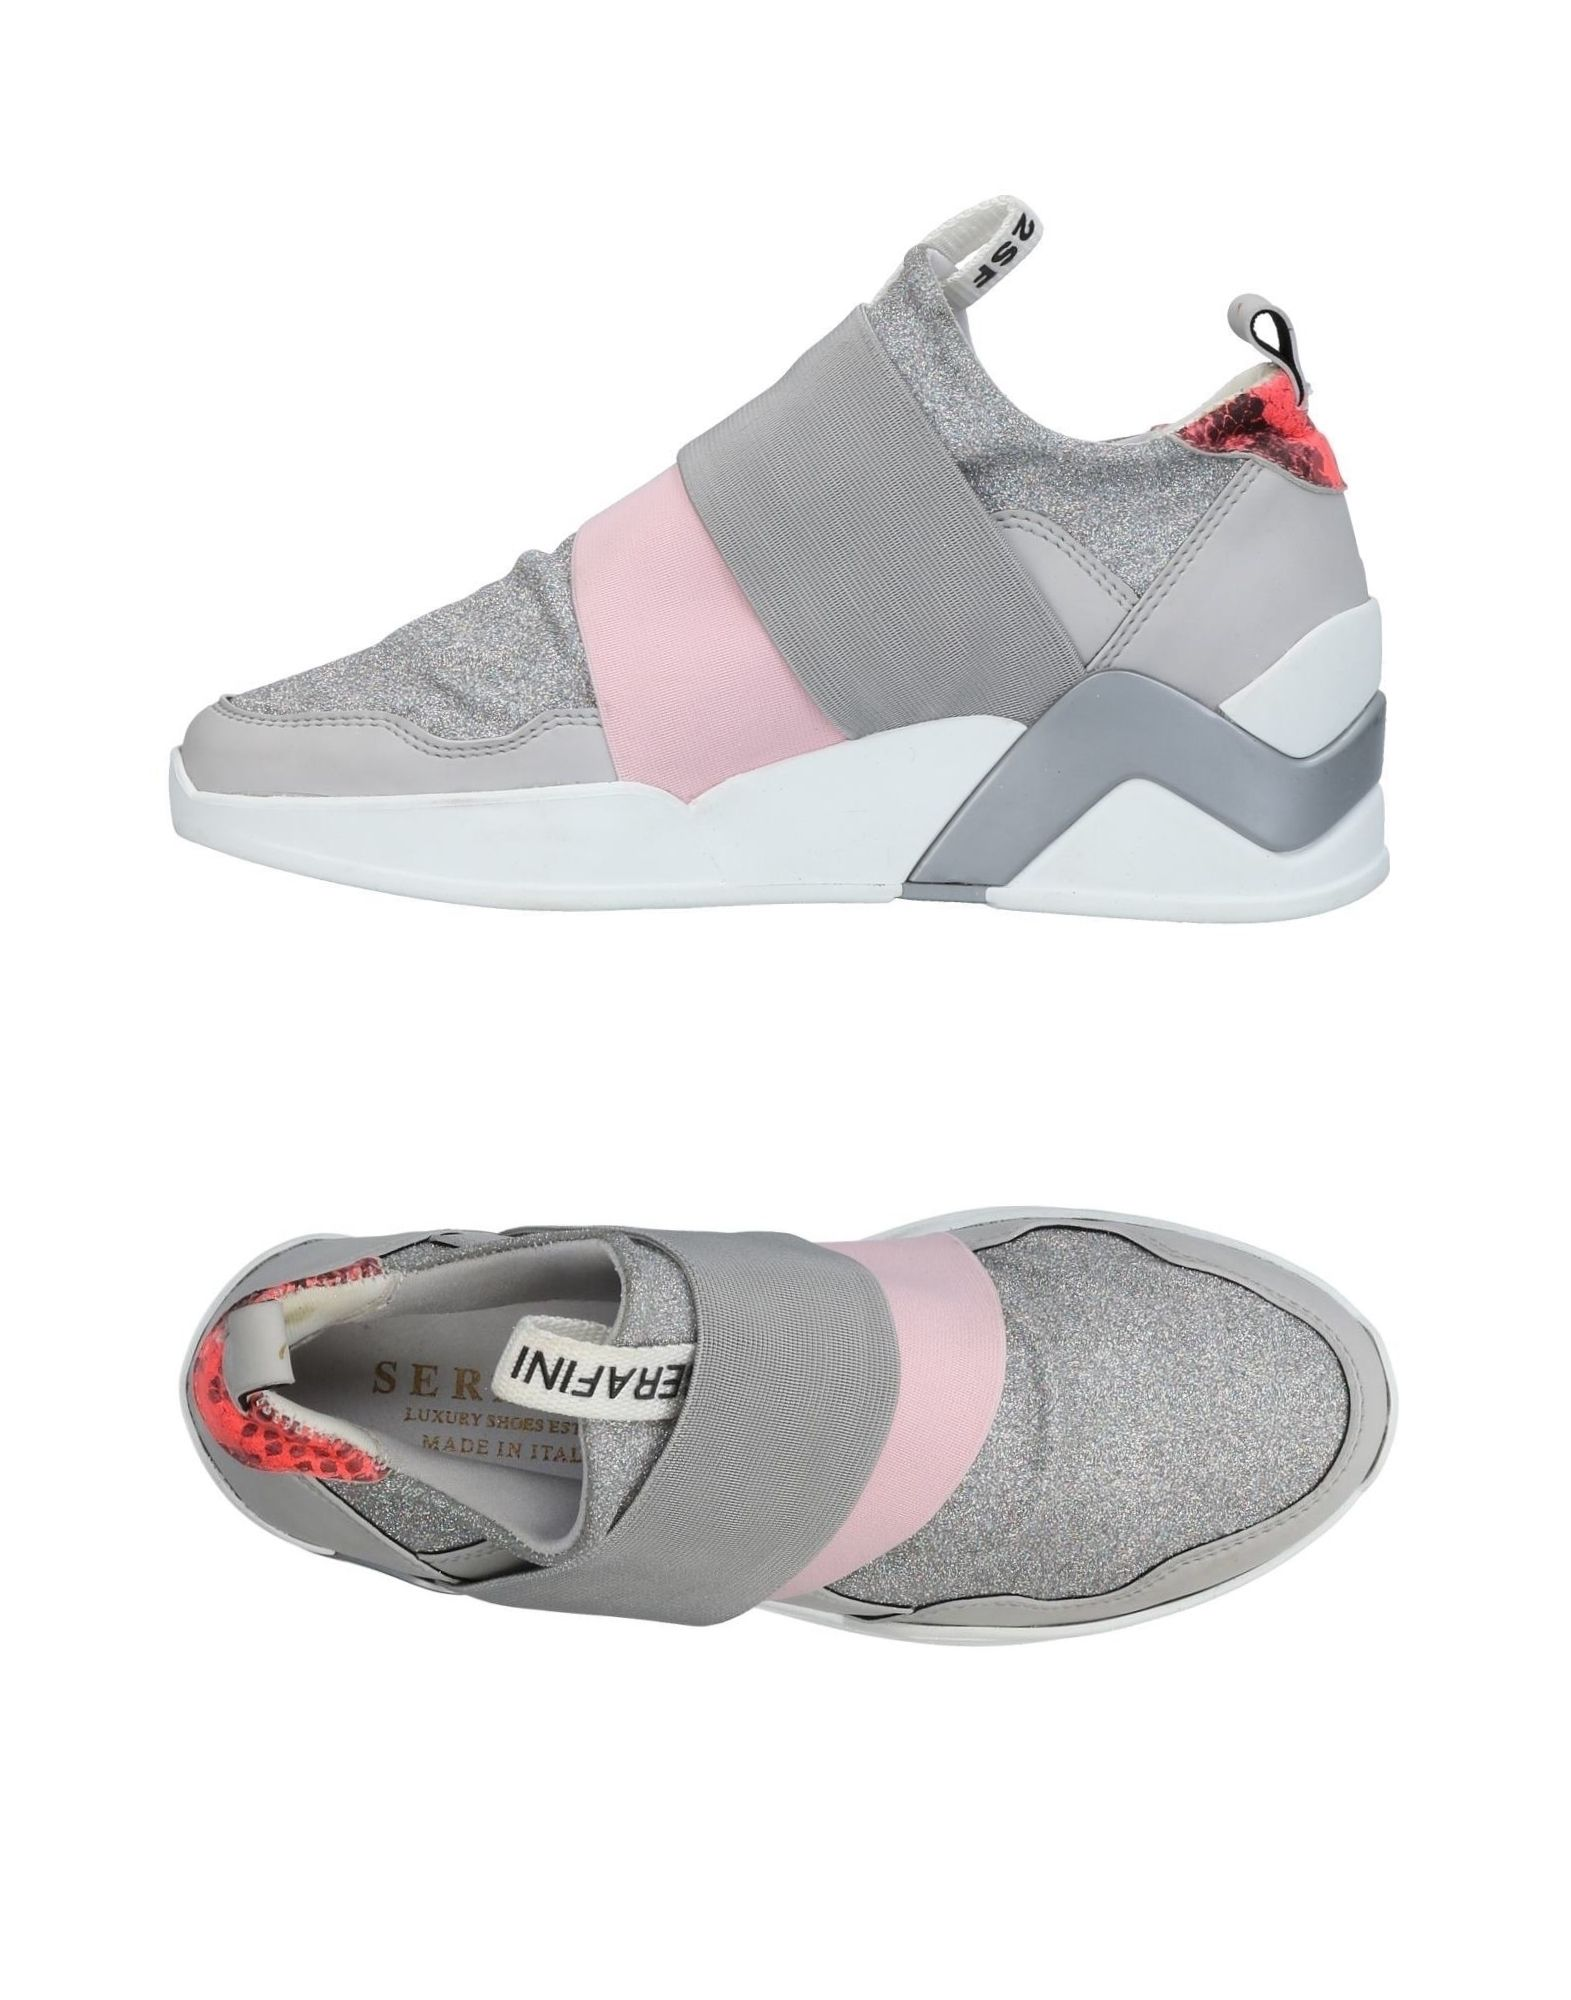 Sneakers Serafini Luxury Donna - 11426314HW